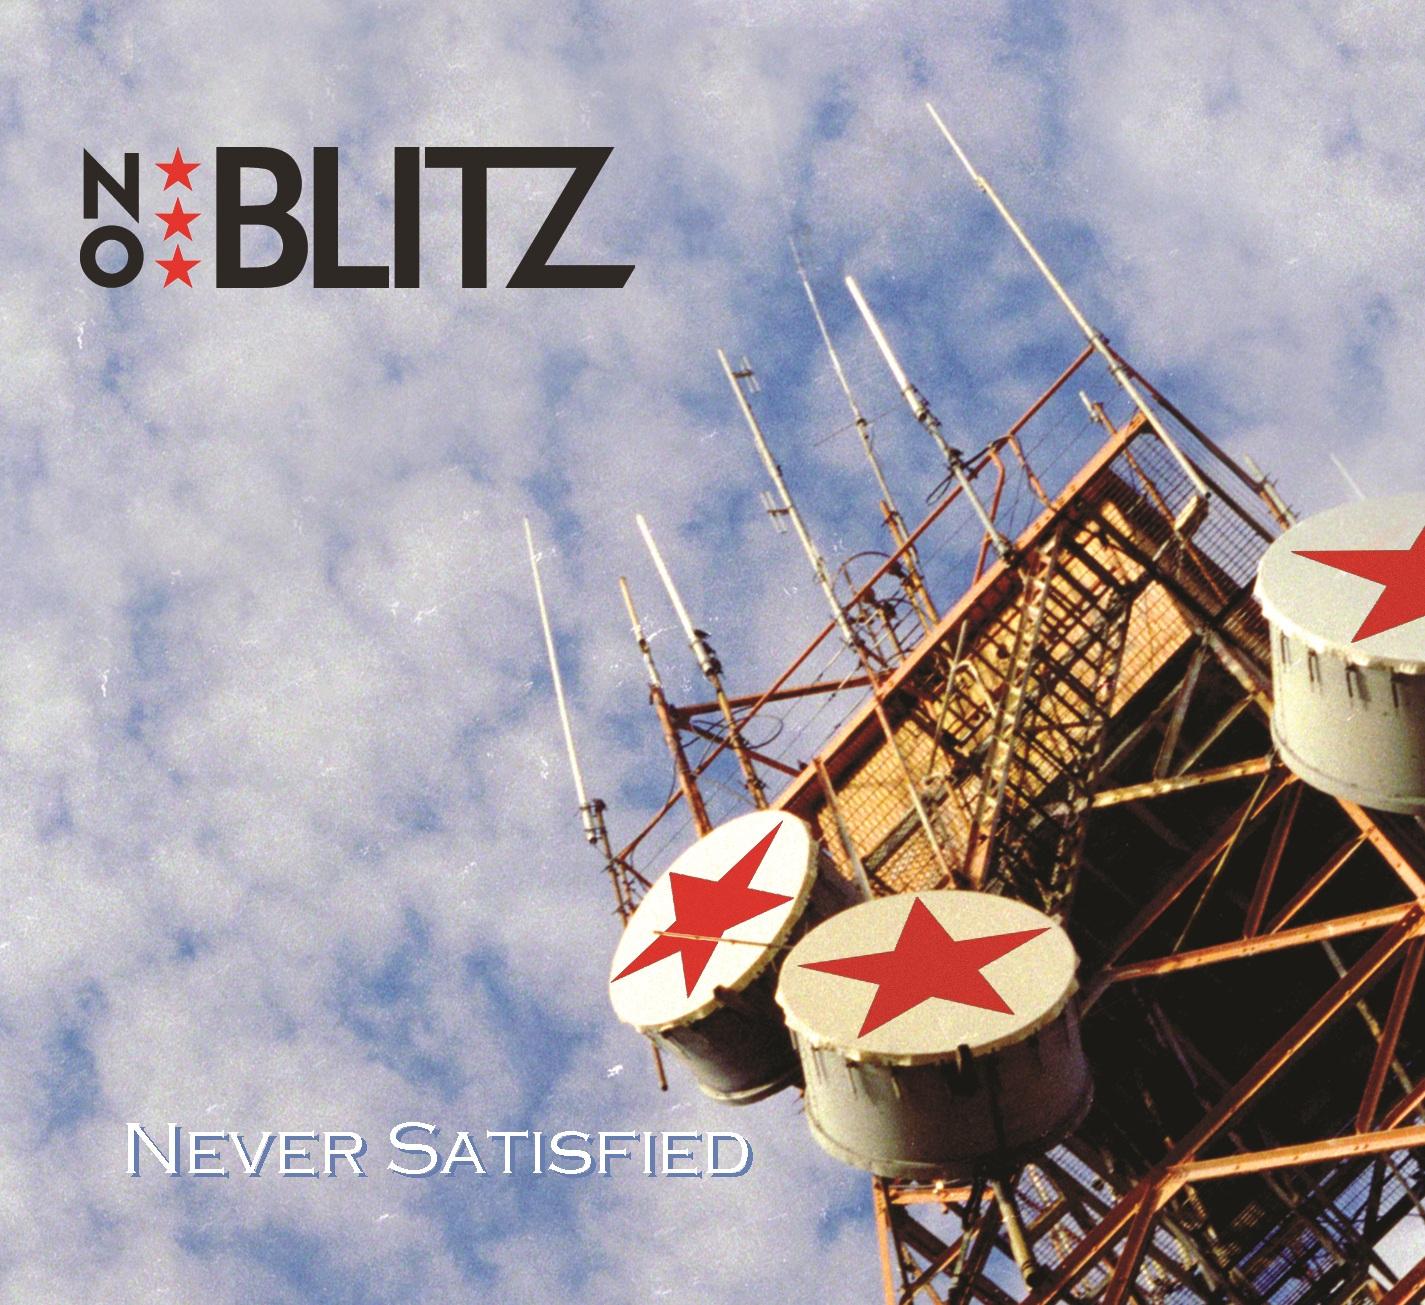 No Blitz - Never Satisfied